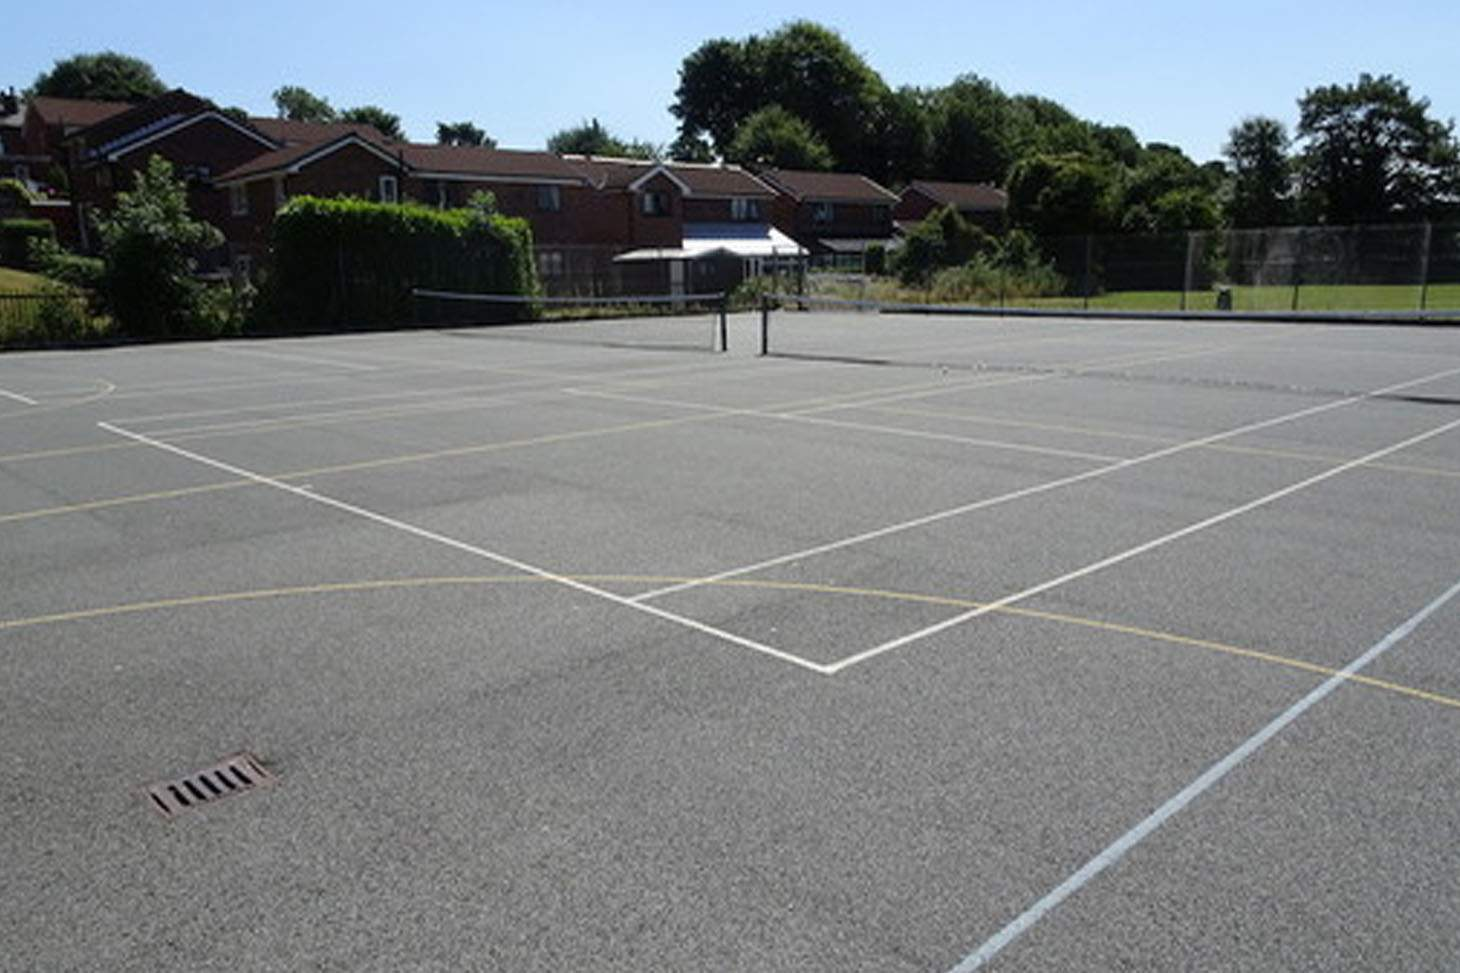 Bury C of E High School Outdoor | Hard (macadam) tennis court